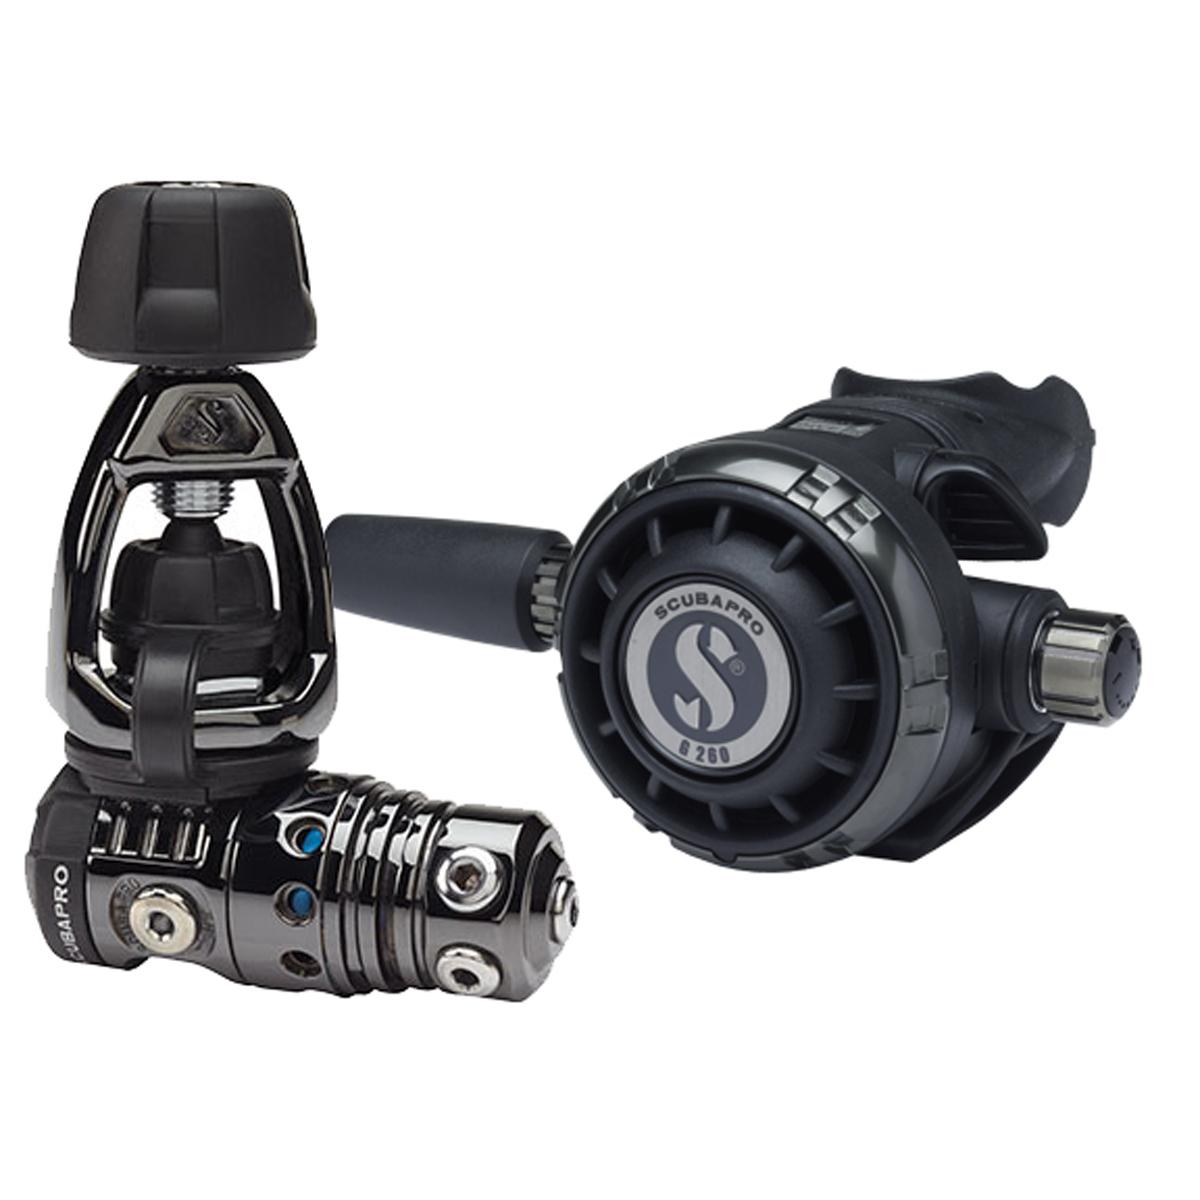 ScubaPro MK25 EVO/G260 Black Tech Regulator (Yoke)